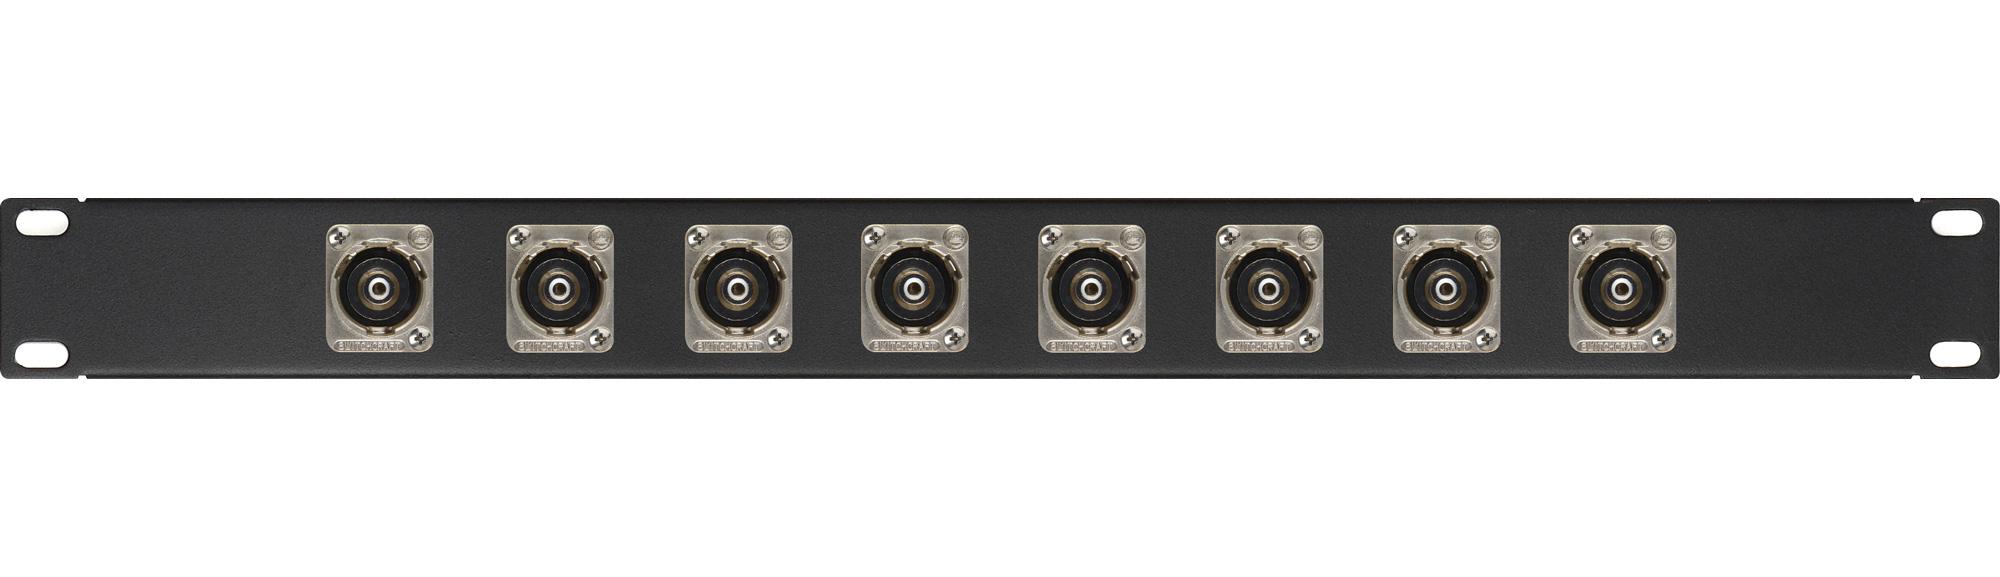 My Custom Shop 8XEHRCABNC 8-Port RCA to BNC Feed-Through Patch Panel w/ Switchcraft E Series - 1RU 8XEHRCABNC